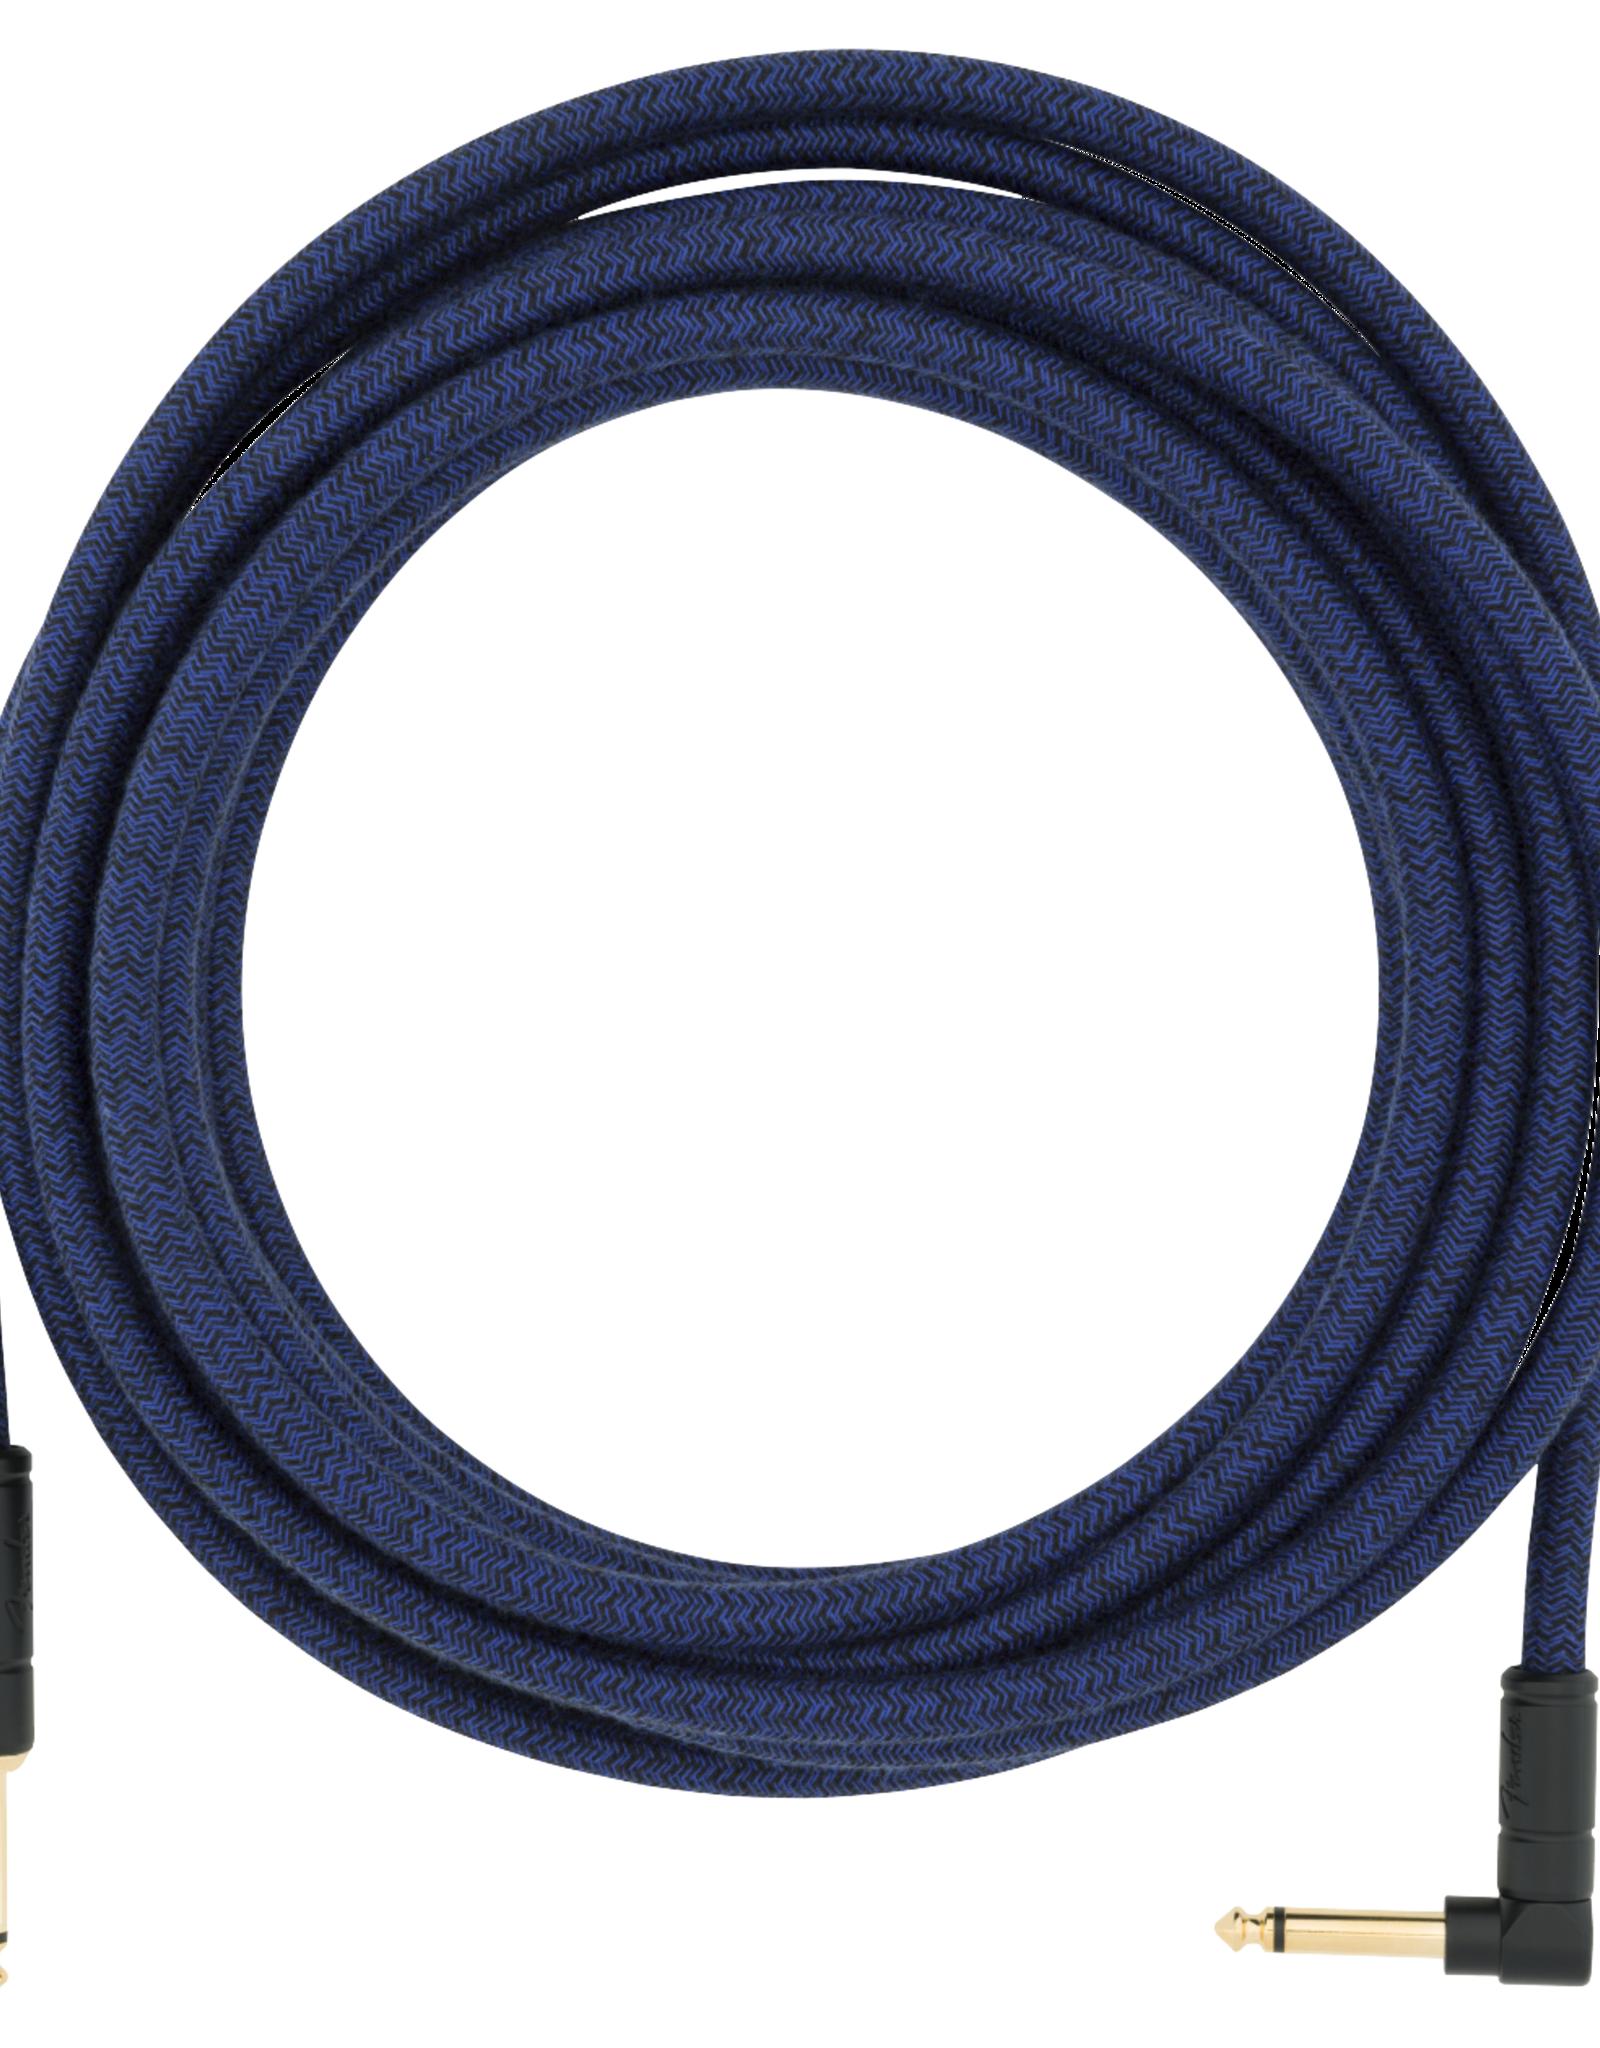 Fender Fender 18.6' Angled Festival Instrument Cable, Pure Hemp, Blue Dream